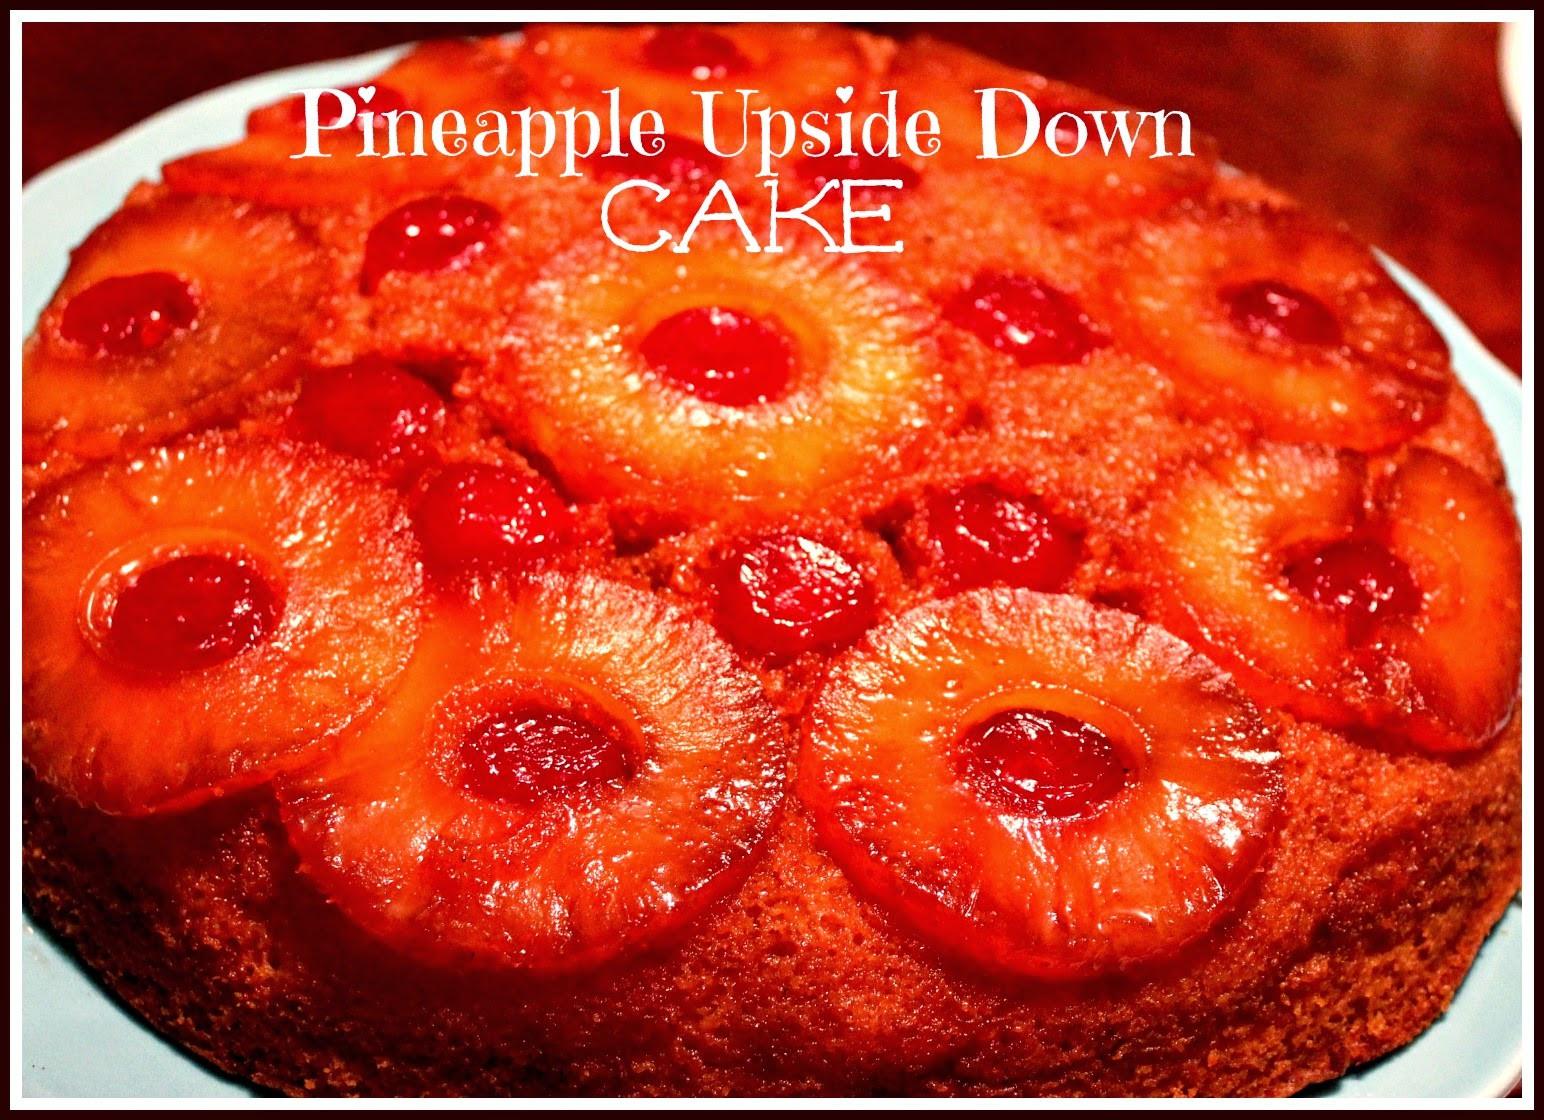 Skillet Pineapple Upside Down Cake  Sweet Tea and Cornbread Iron Skillet Pineapple Upside